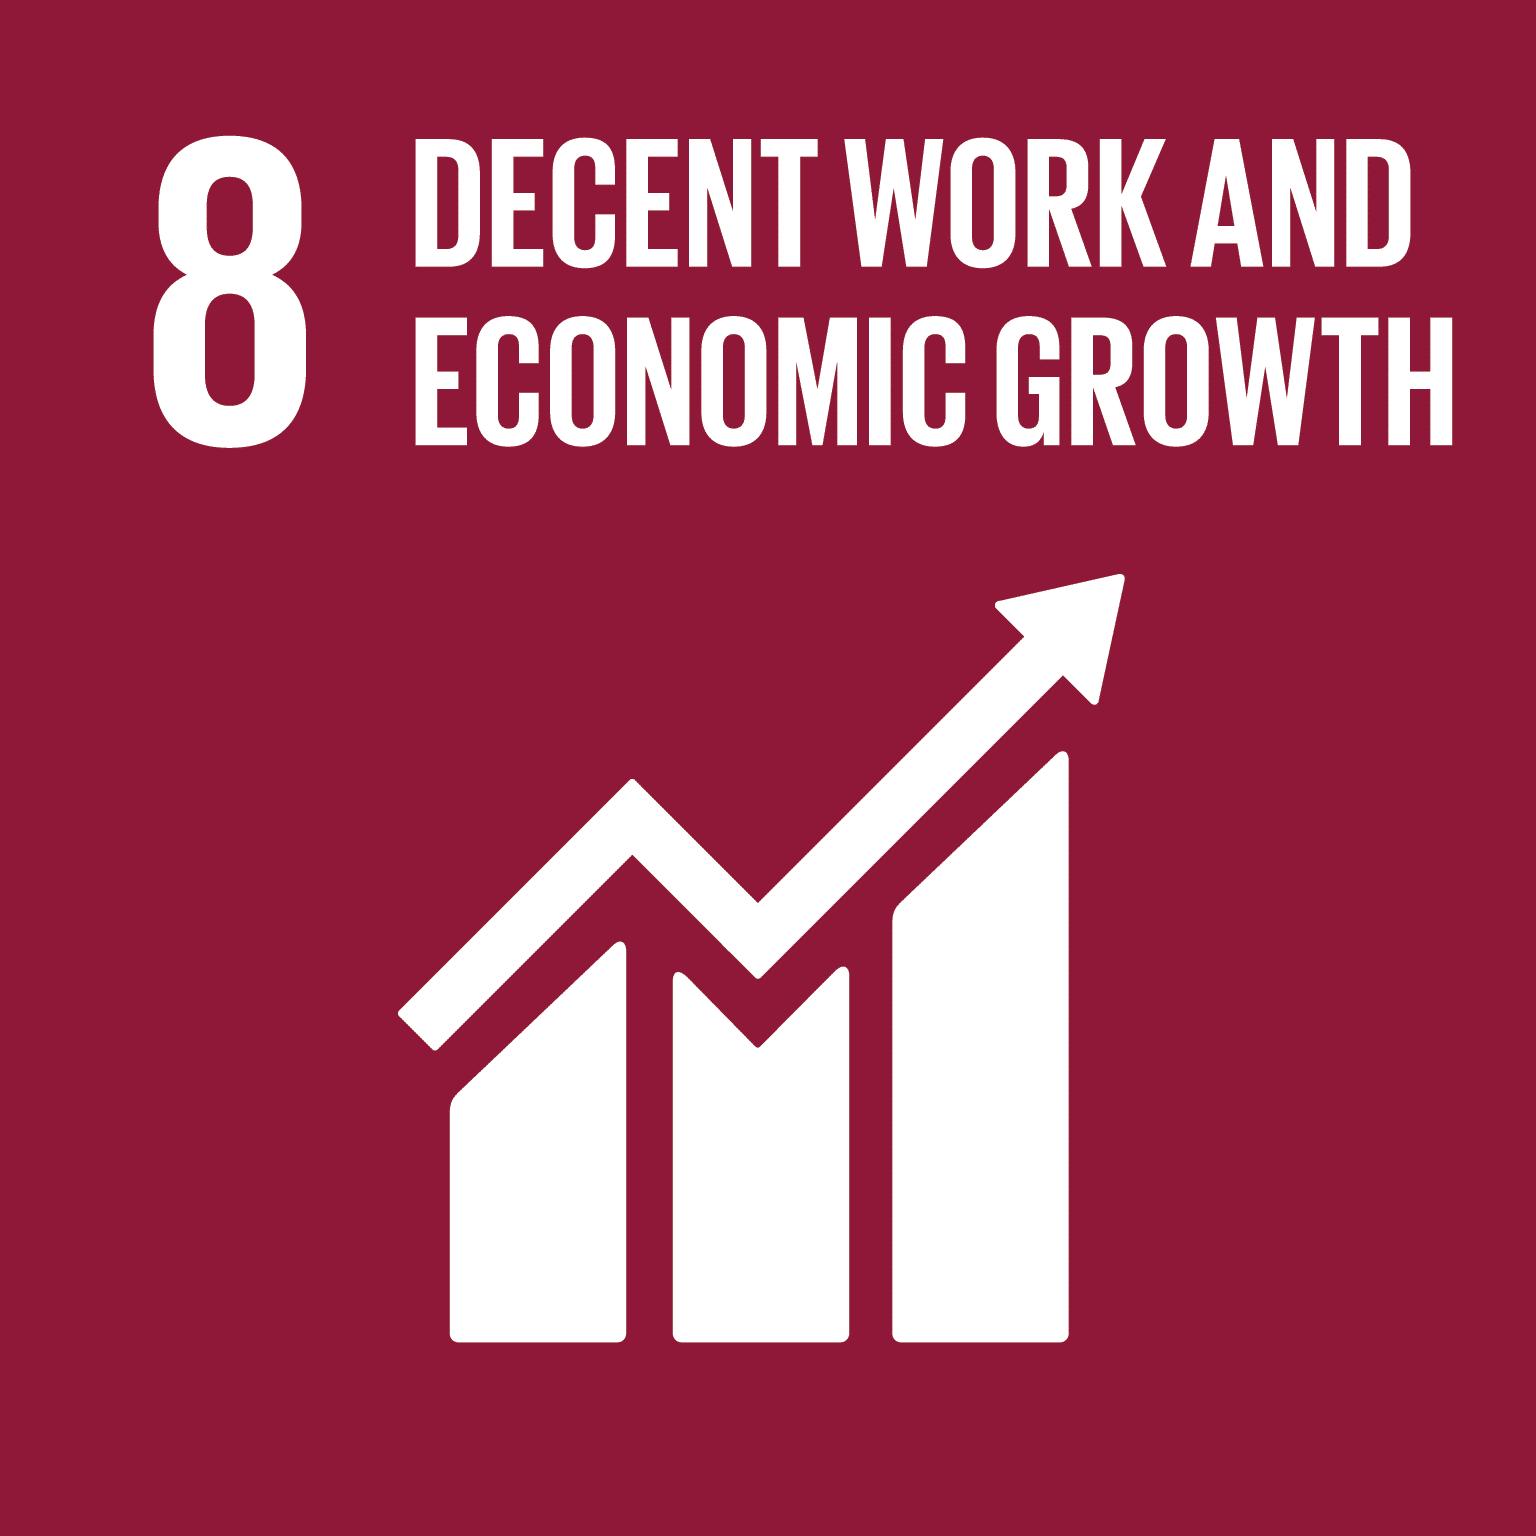 SDG 8: Decent work and economic growth